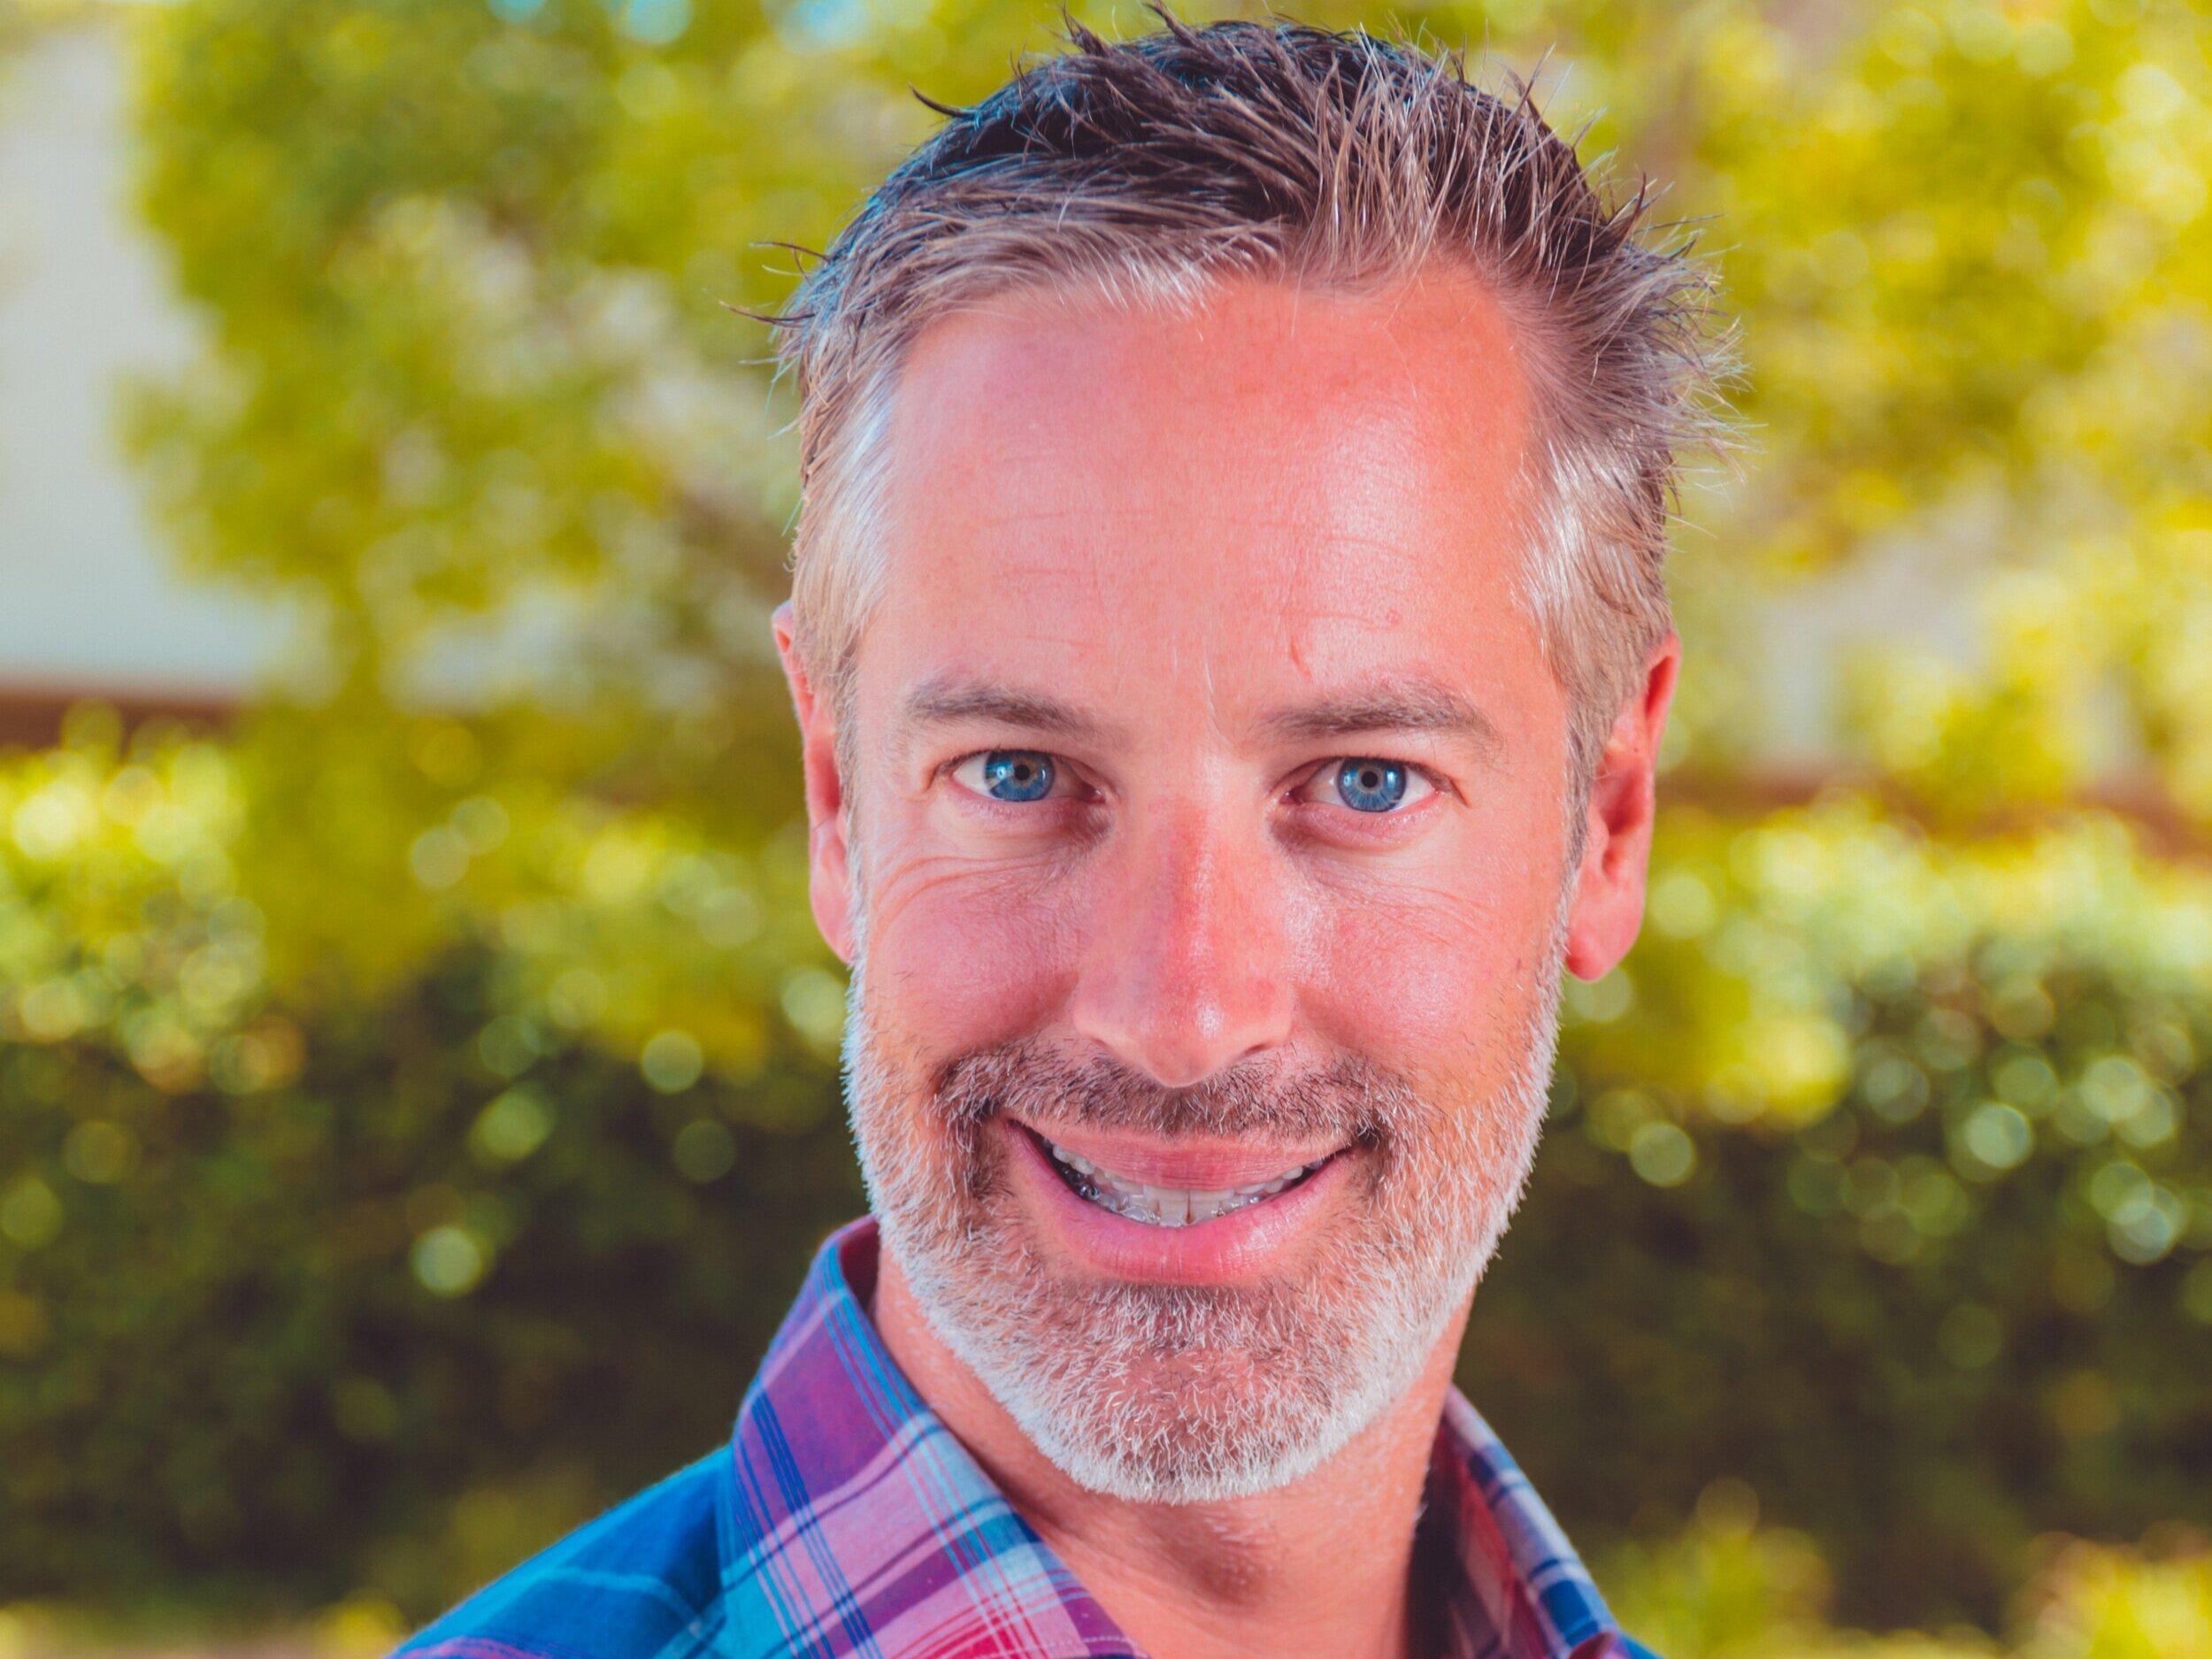 Trevor Klein有12年的战略规划经验, e-commerce and online marketing, 特雷弗为董事会带来了丰富的知识和策略.